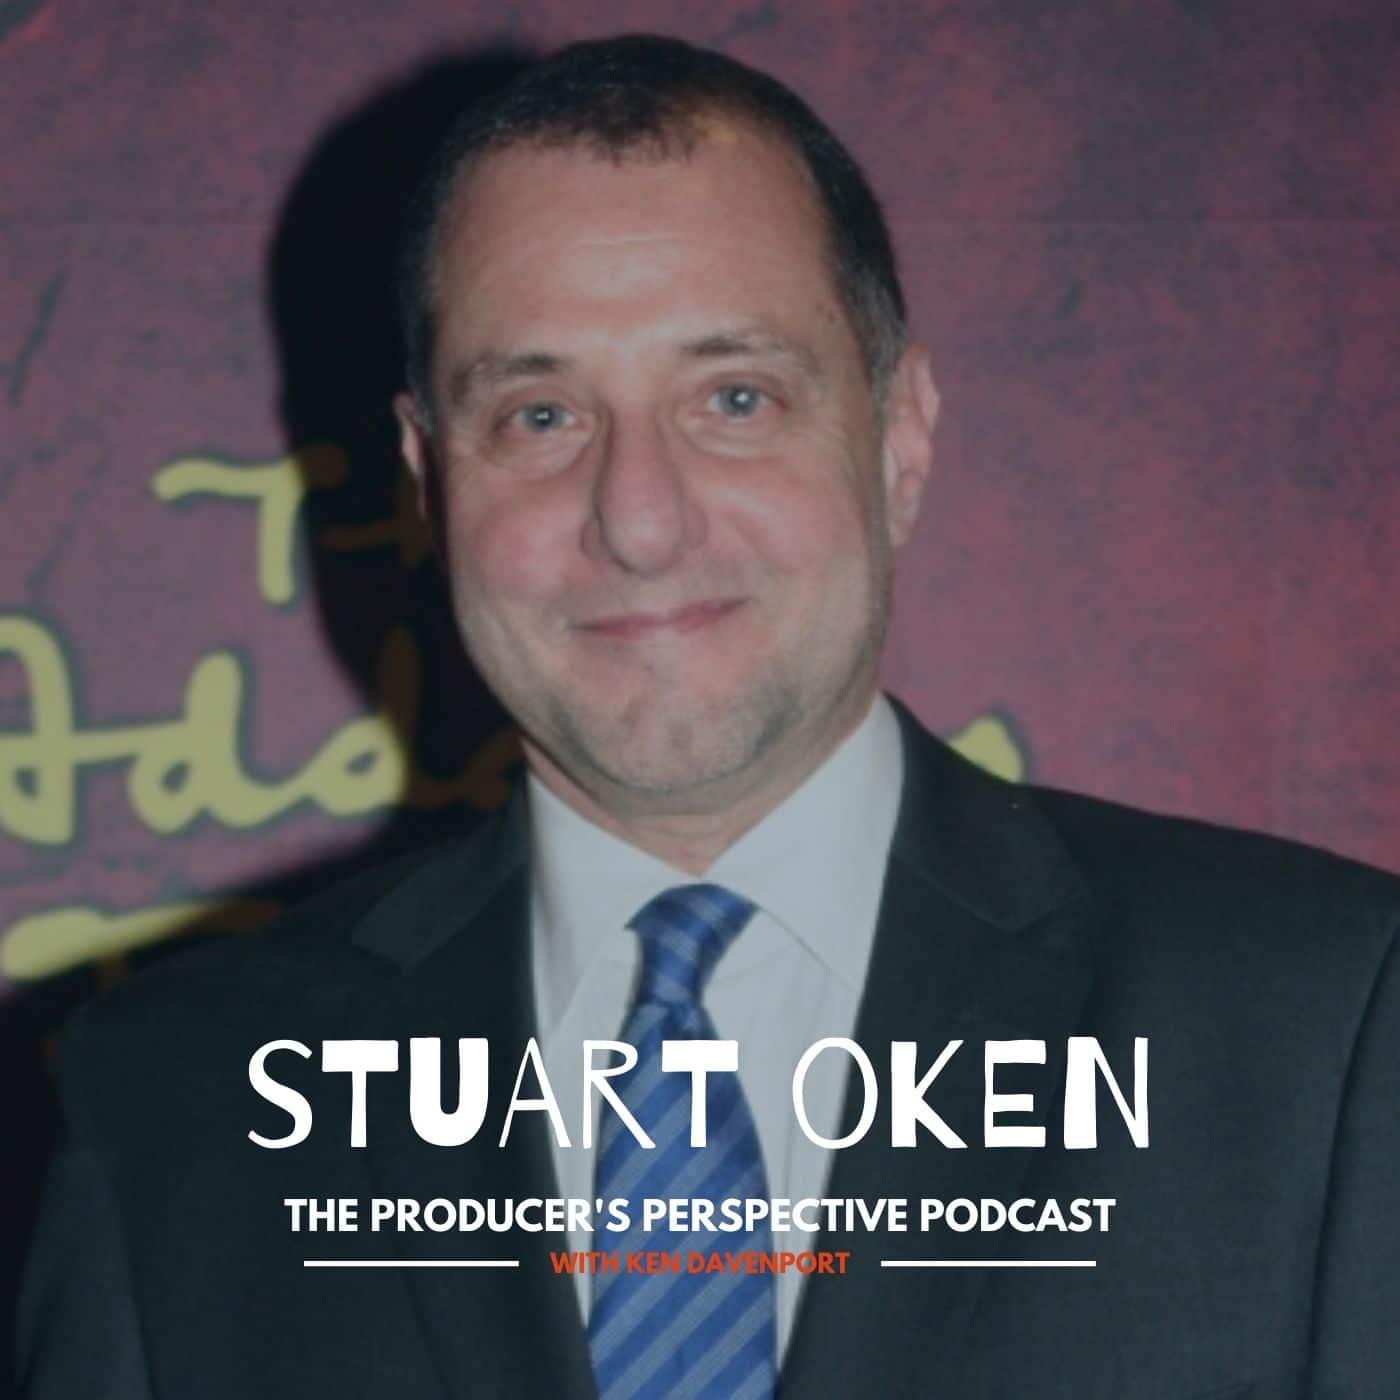 Ken Davenport's The Producer's Perspective Podcast Episode 27 - Stuart Oken